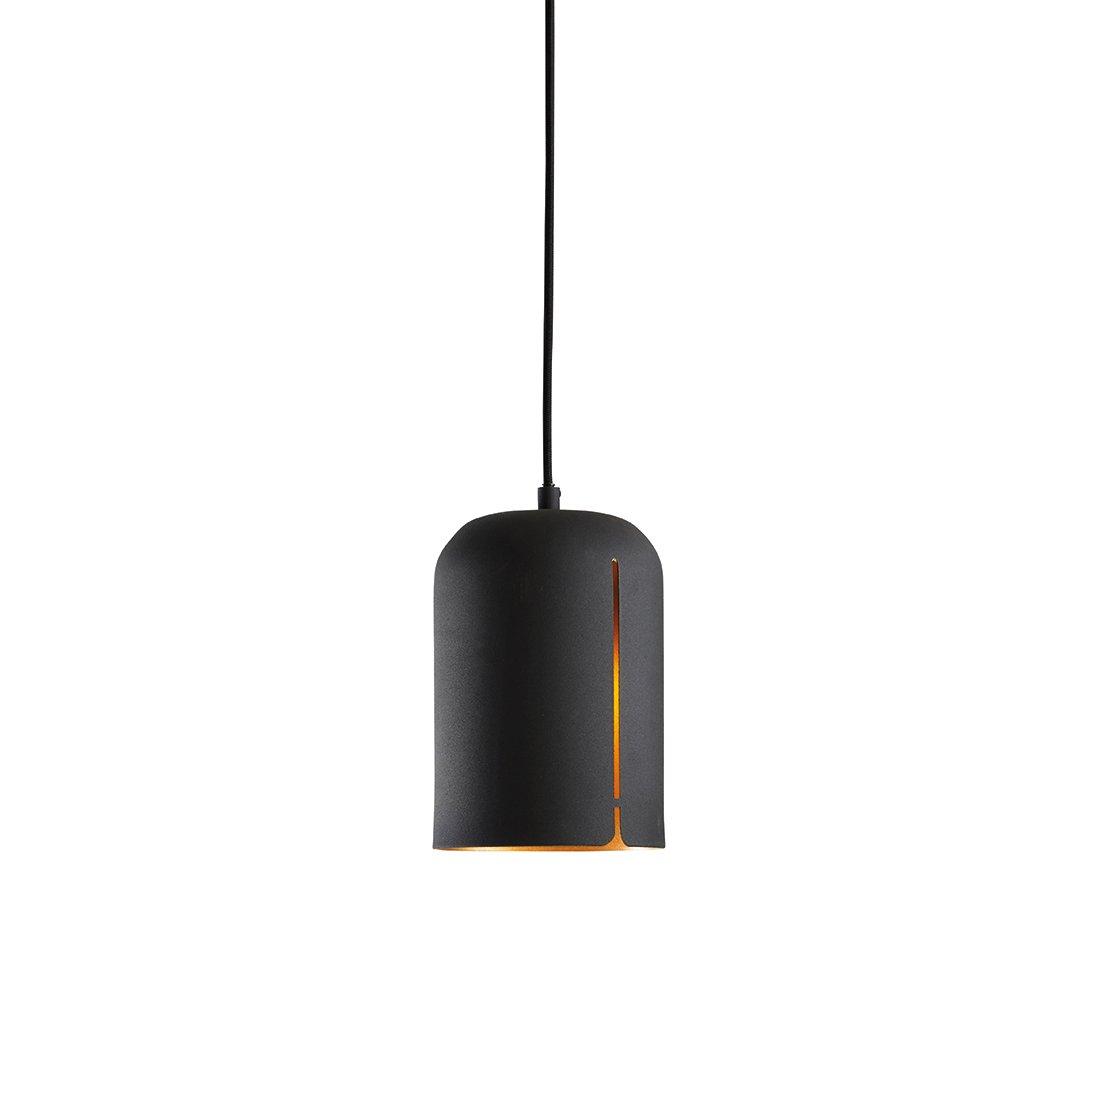 WOUD Gap Short Hanglamp Zwart